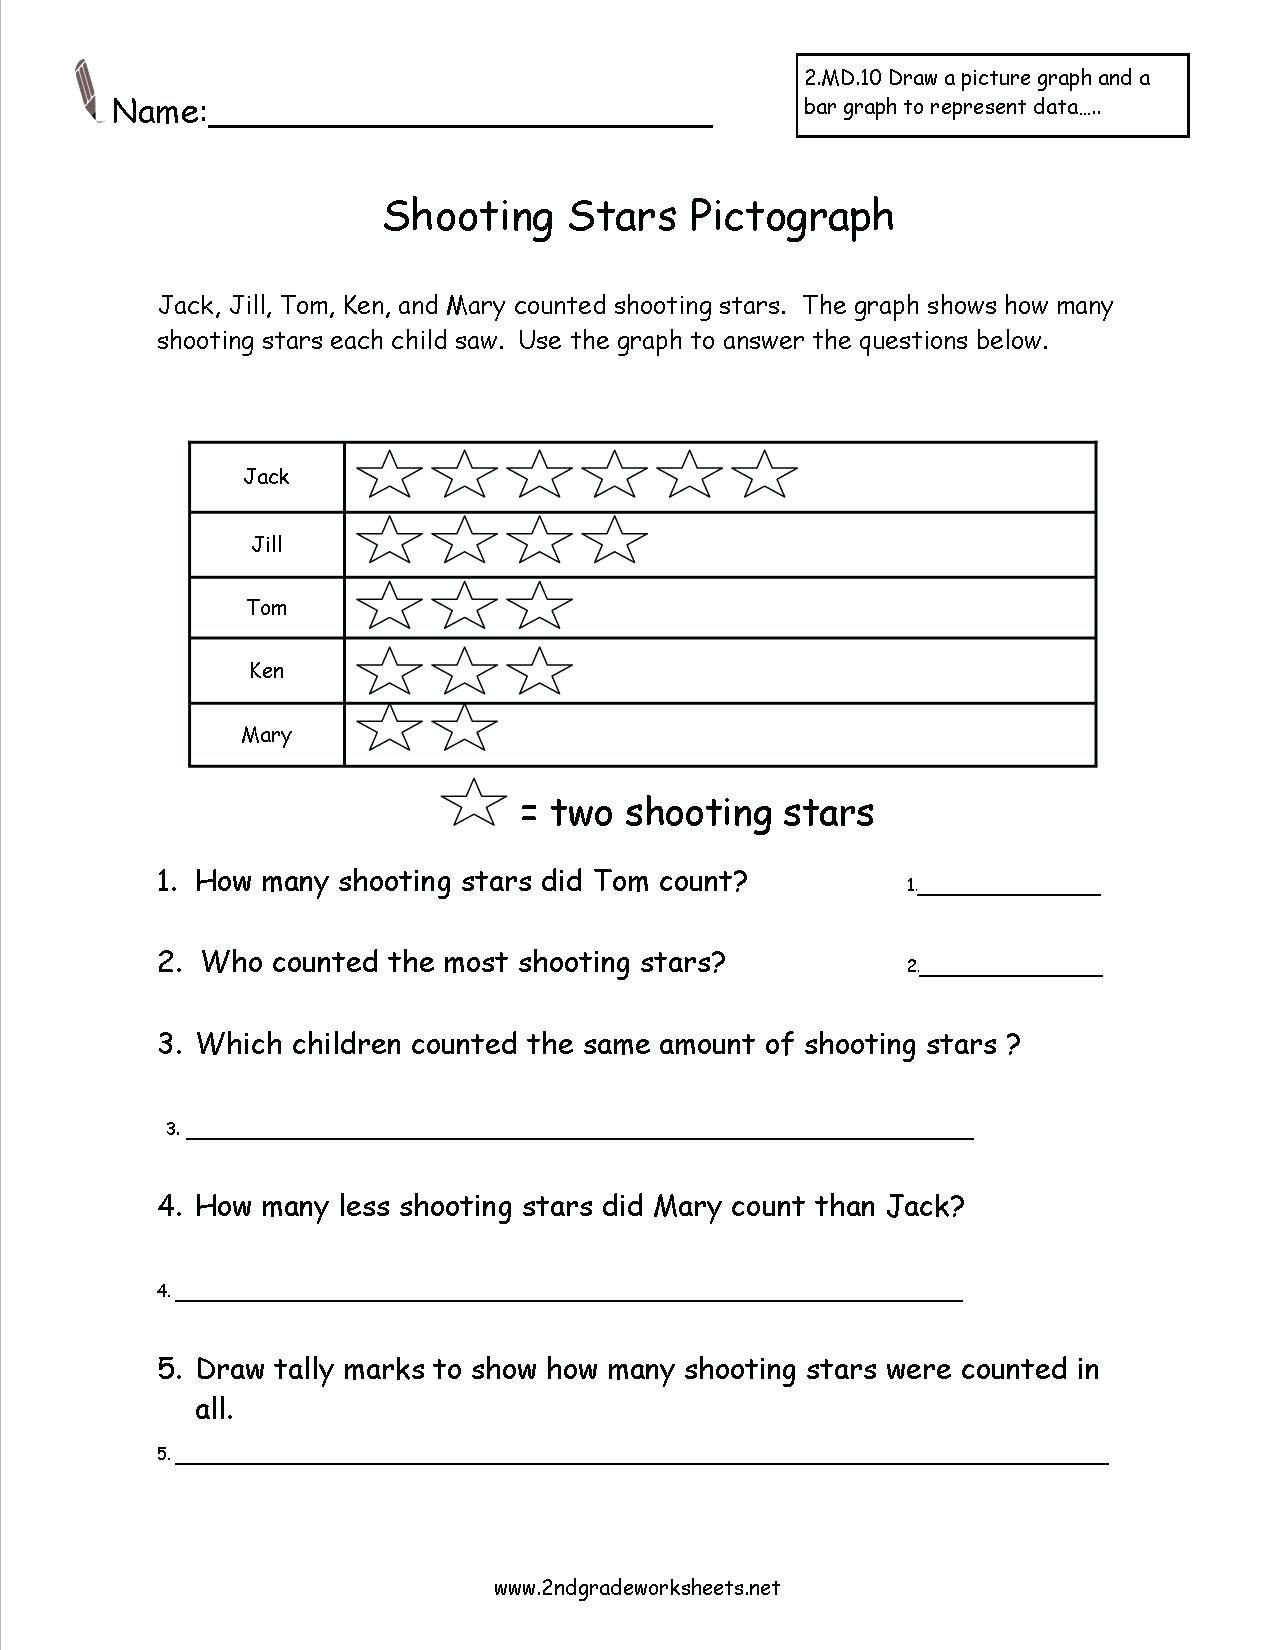 Worksheet Alphabet Phonics Worksheets Times Table Practice Sheets For Social Skills Worksheets For Middle School